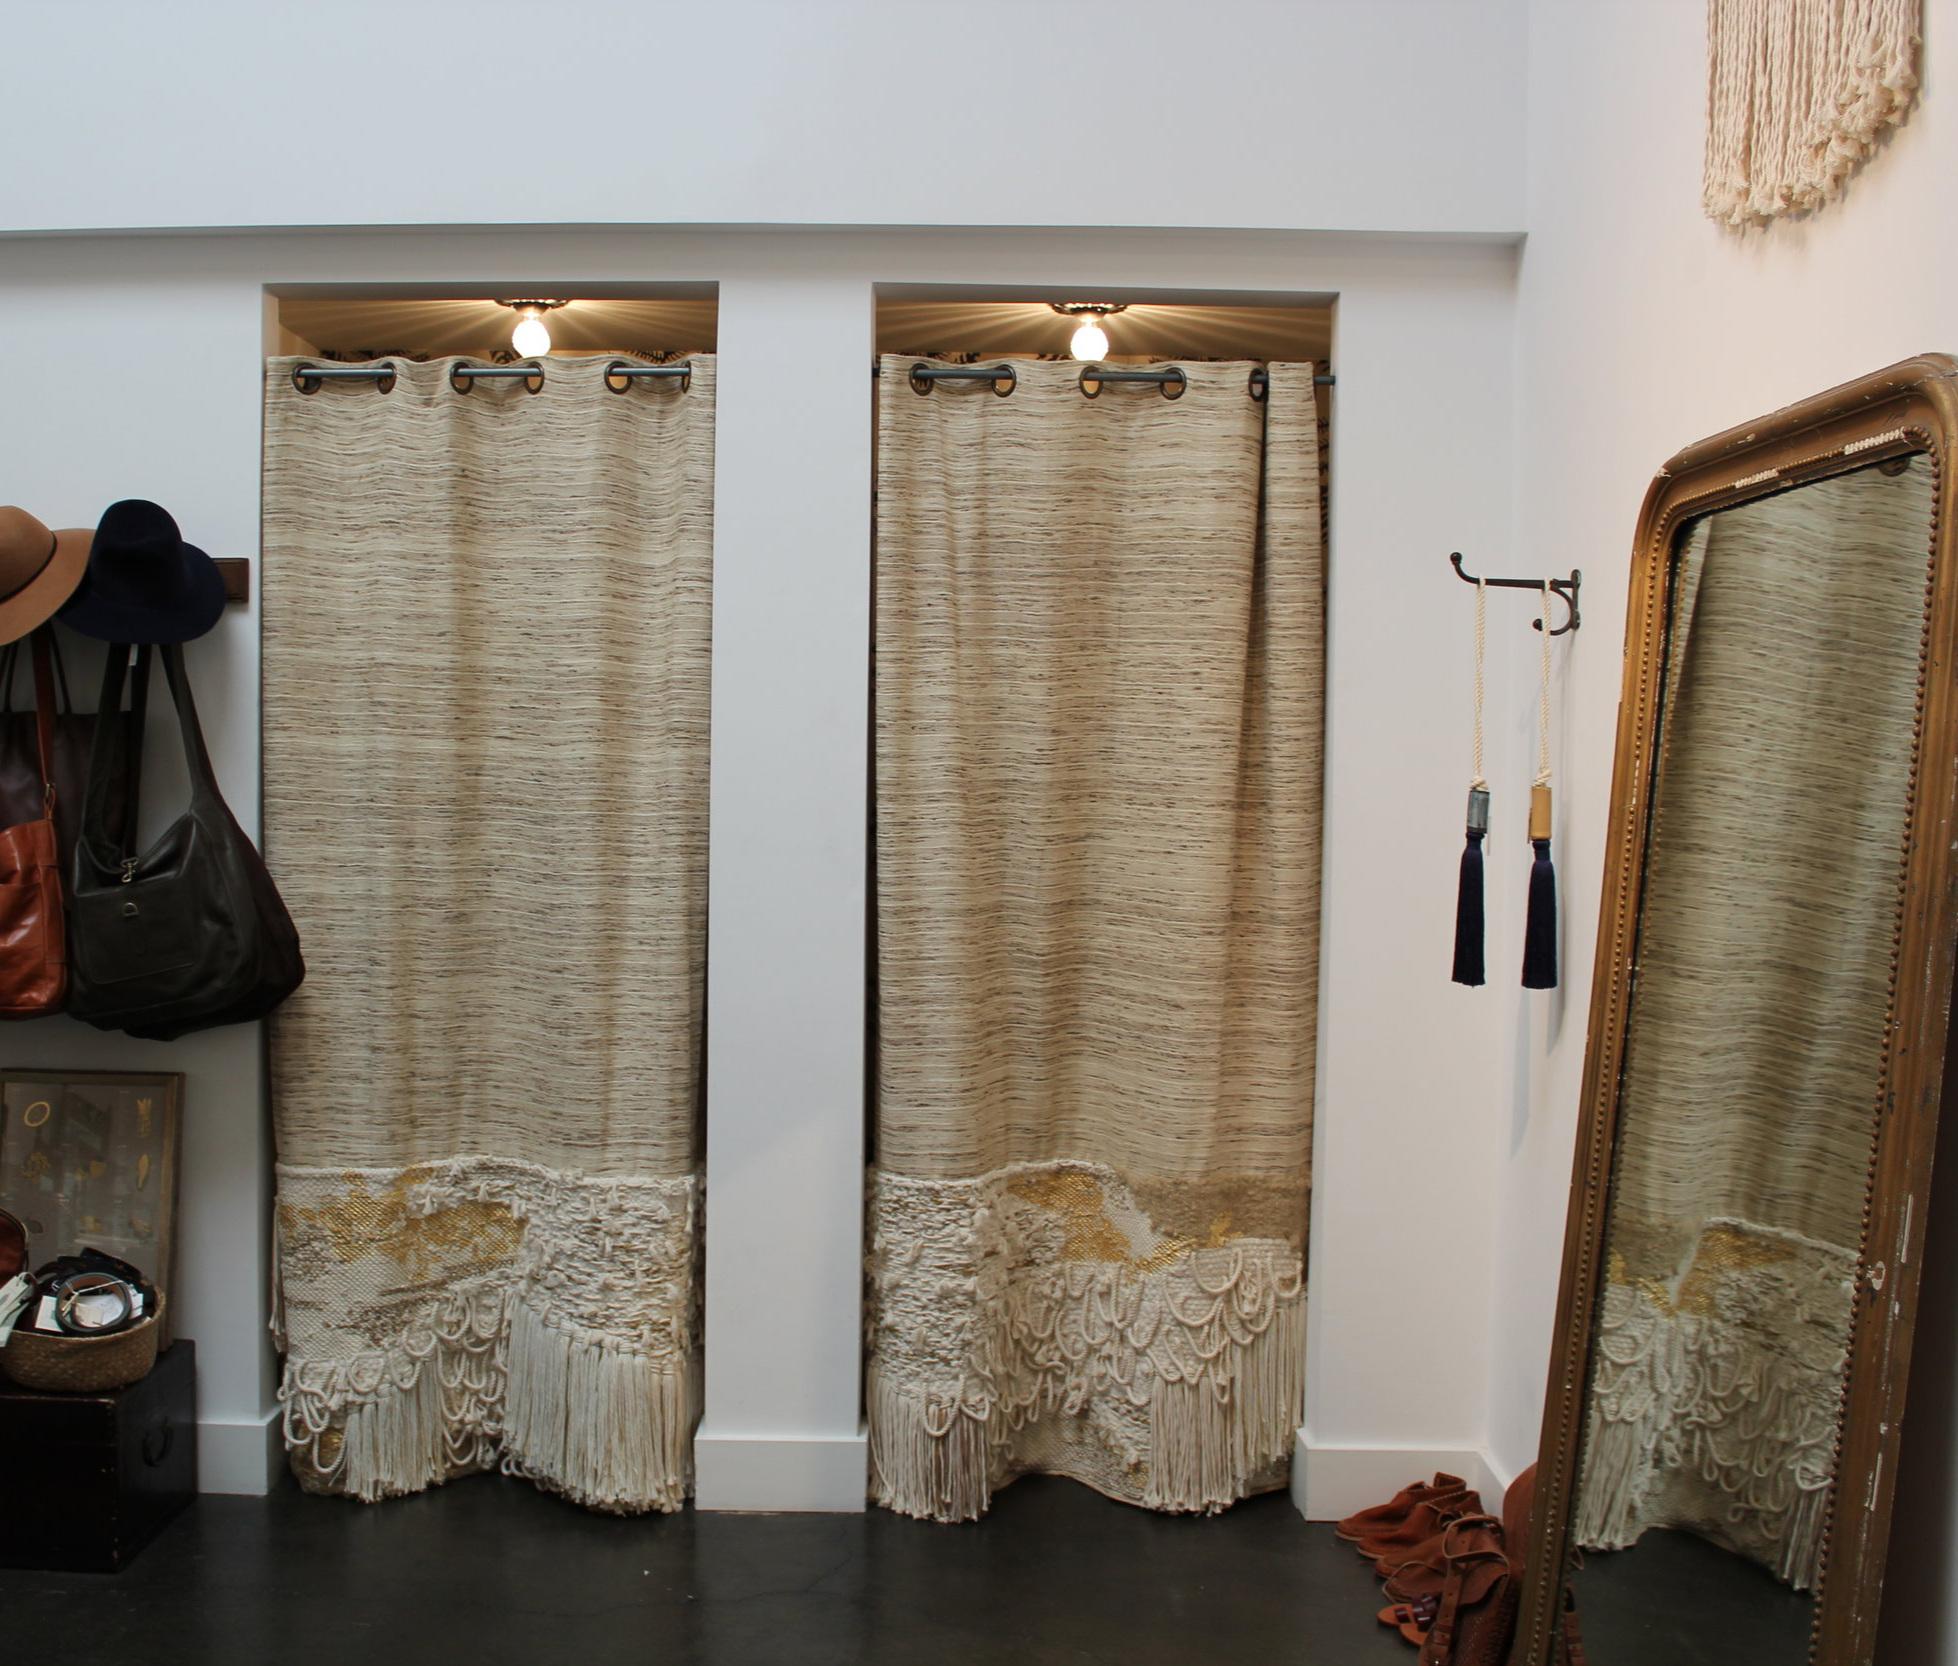 DRESSING ROOM CURTAINS @ ERICA TANOV, BERKELEY